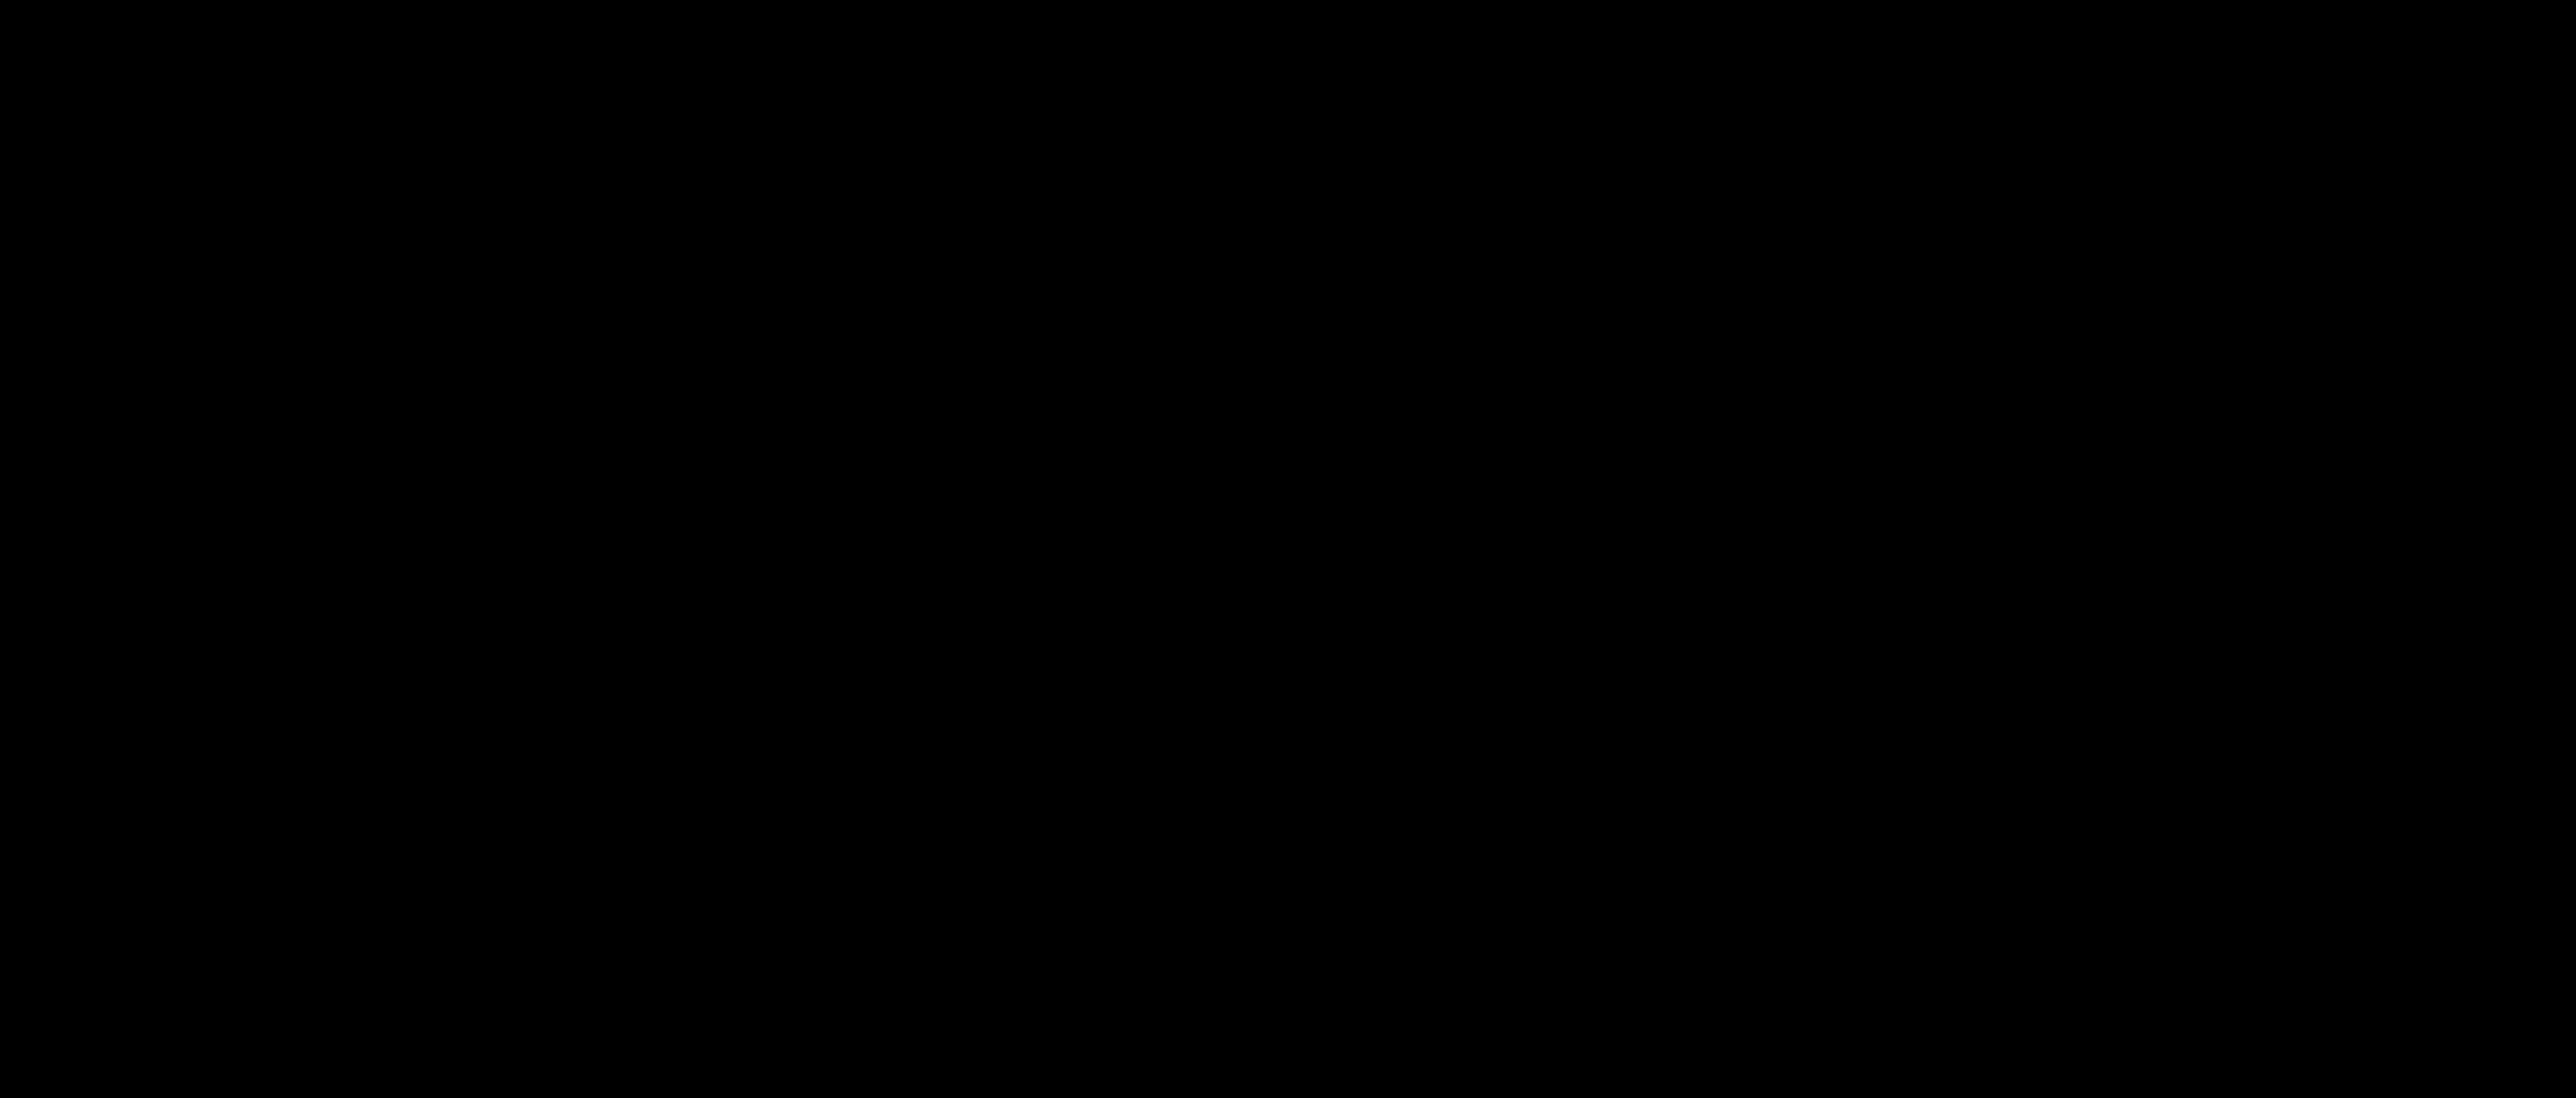 20190218_162150a